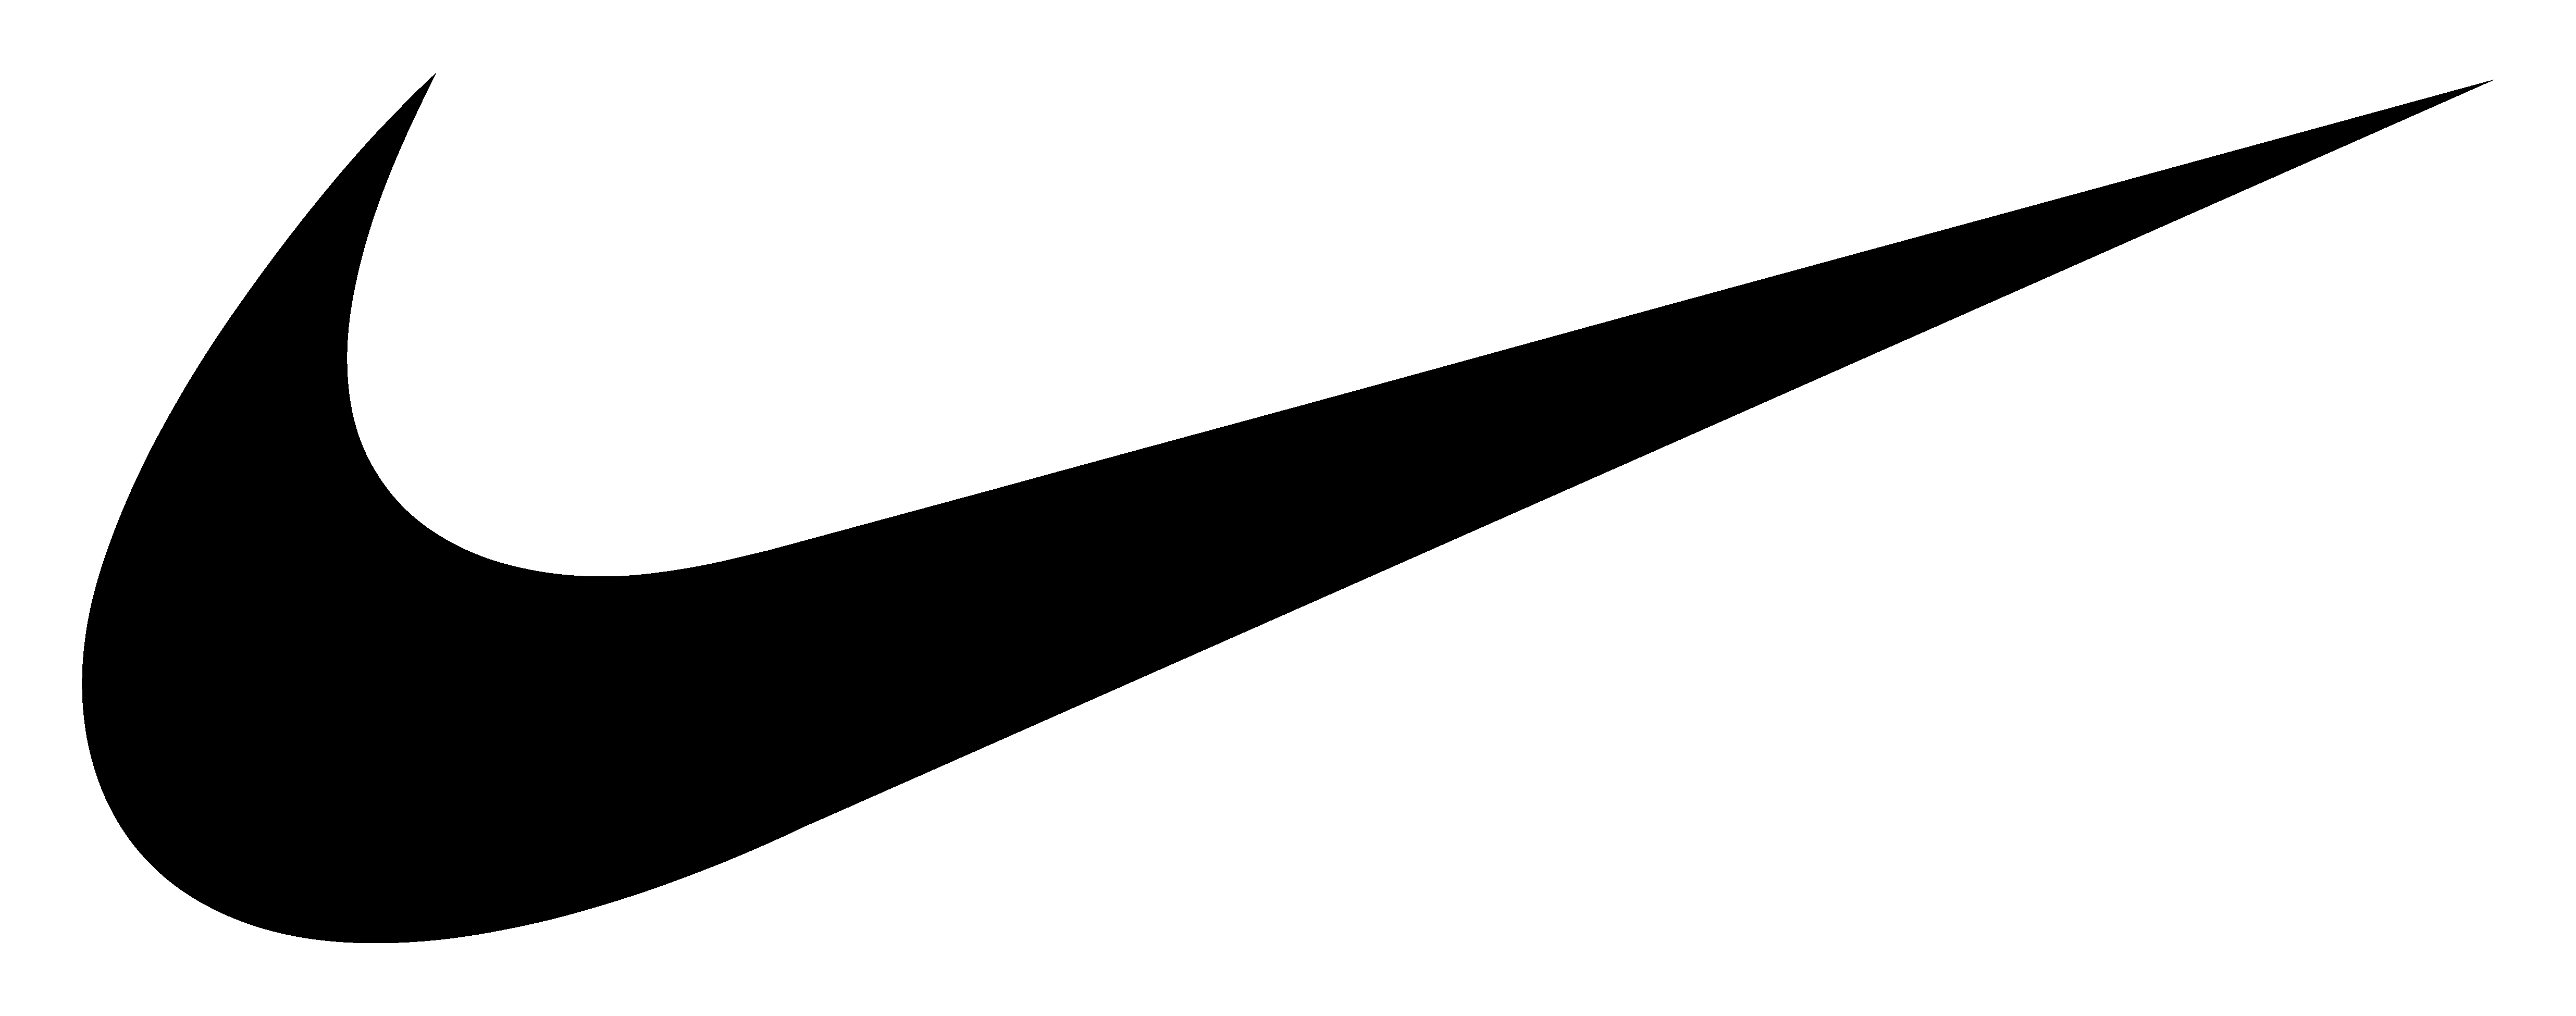 Nike clipart transparent banner free nike-logo-png-transparent-images-clipart-icons-pngriver-download ... banner free